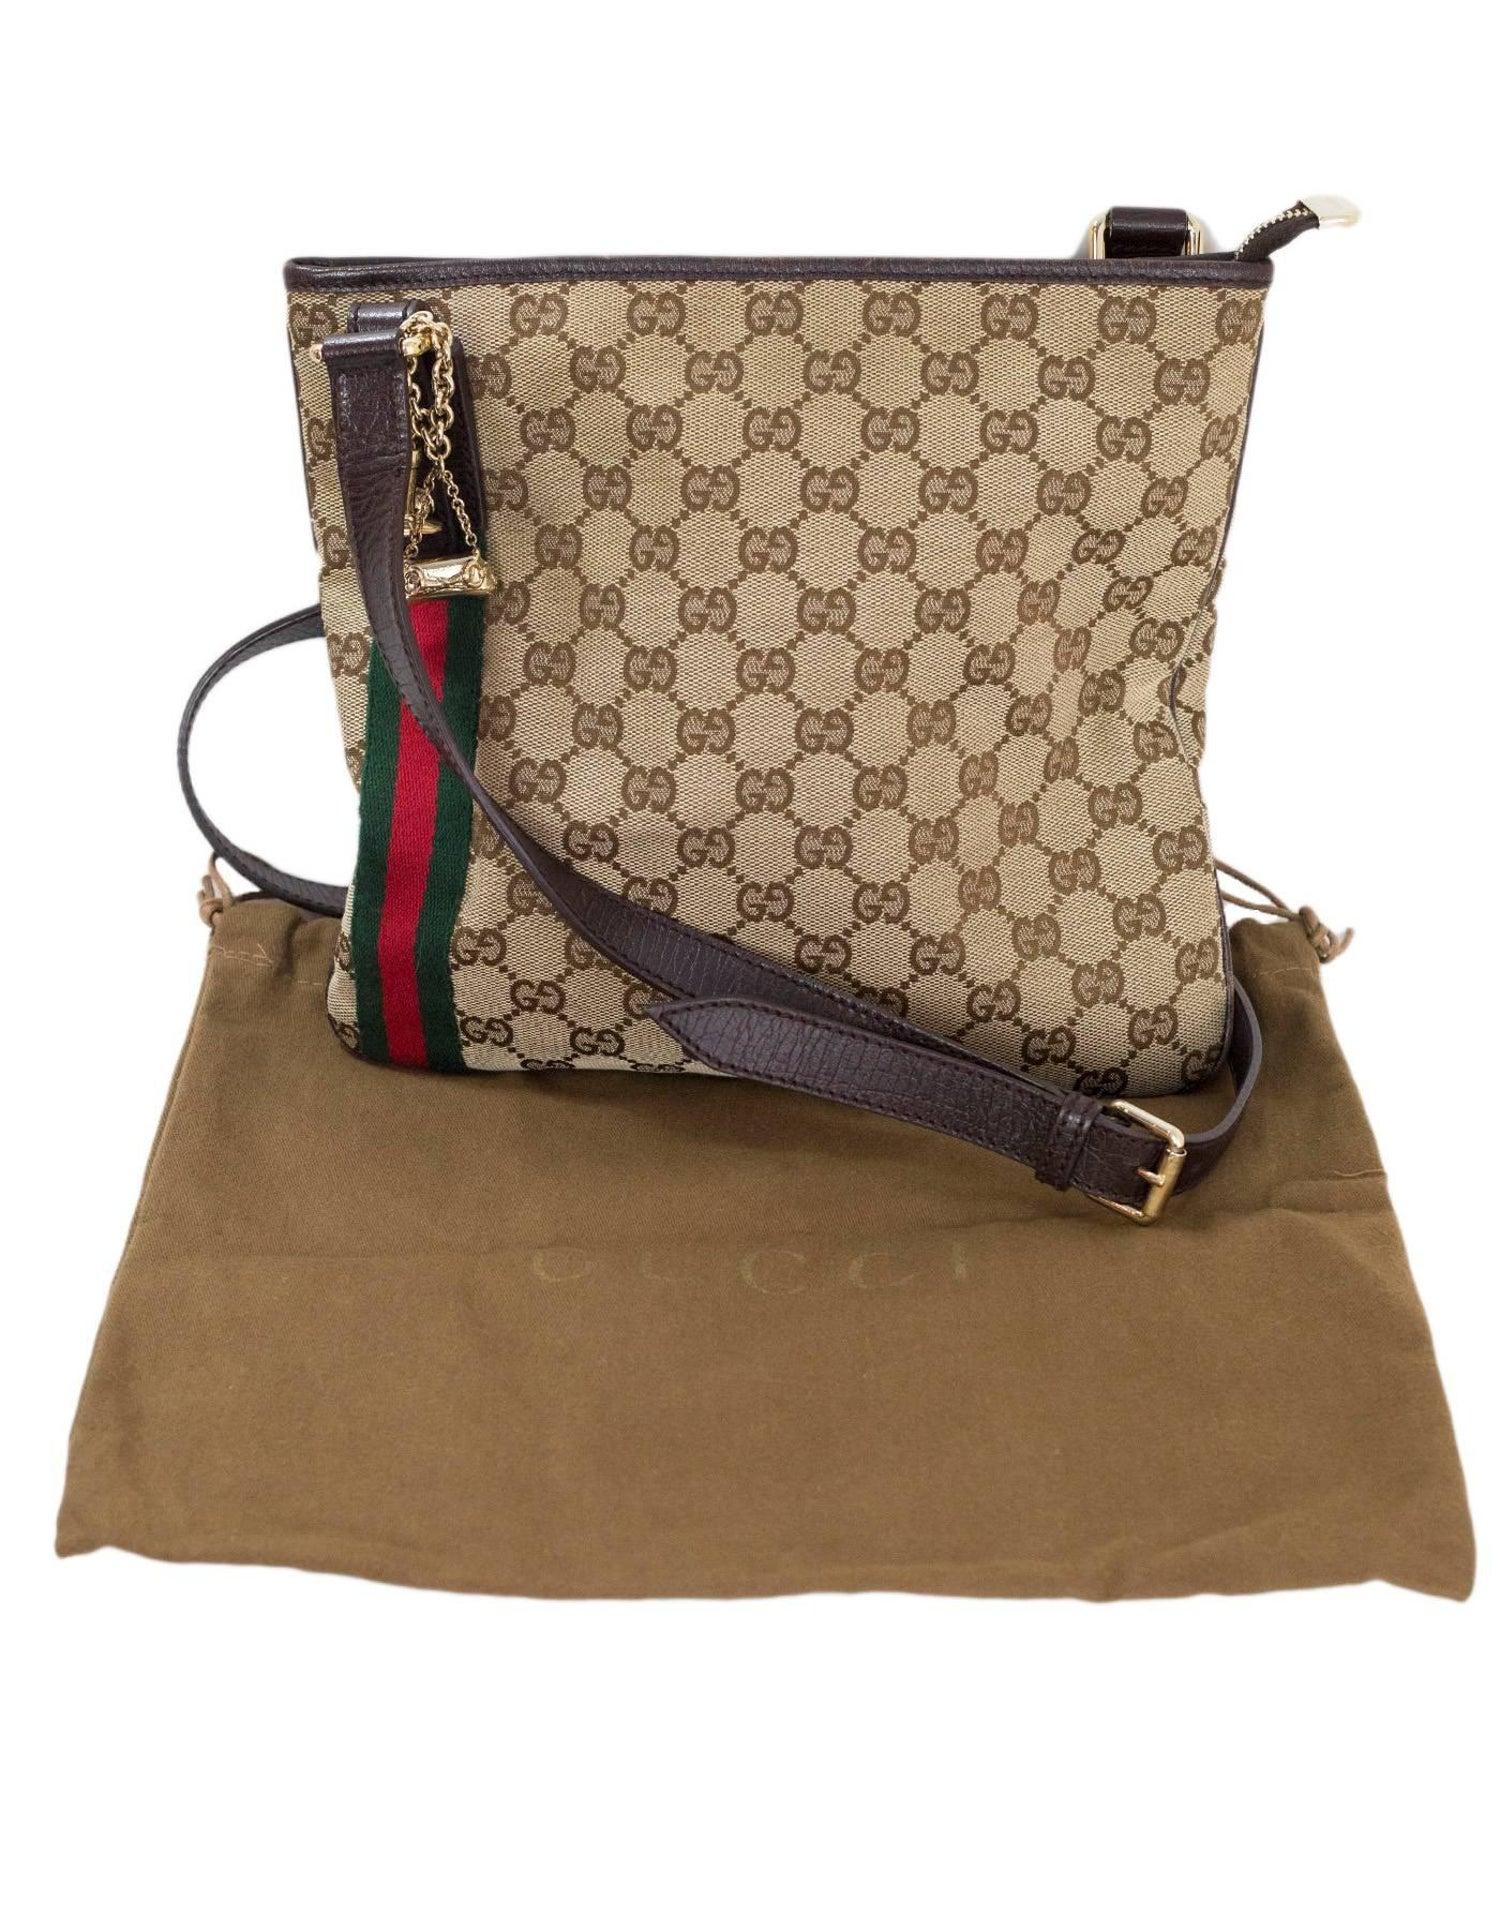 bd07a1803 Gucci Monogram and Web Jolicoeur Charms Messenger Bag For Sale at 1stdibs